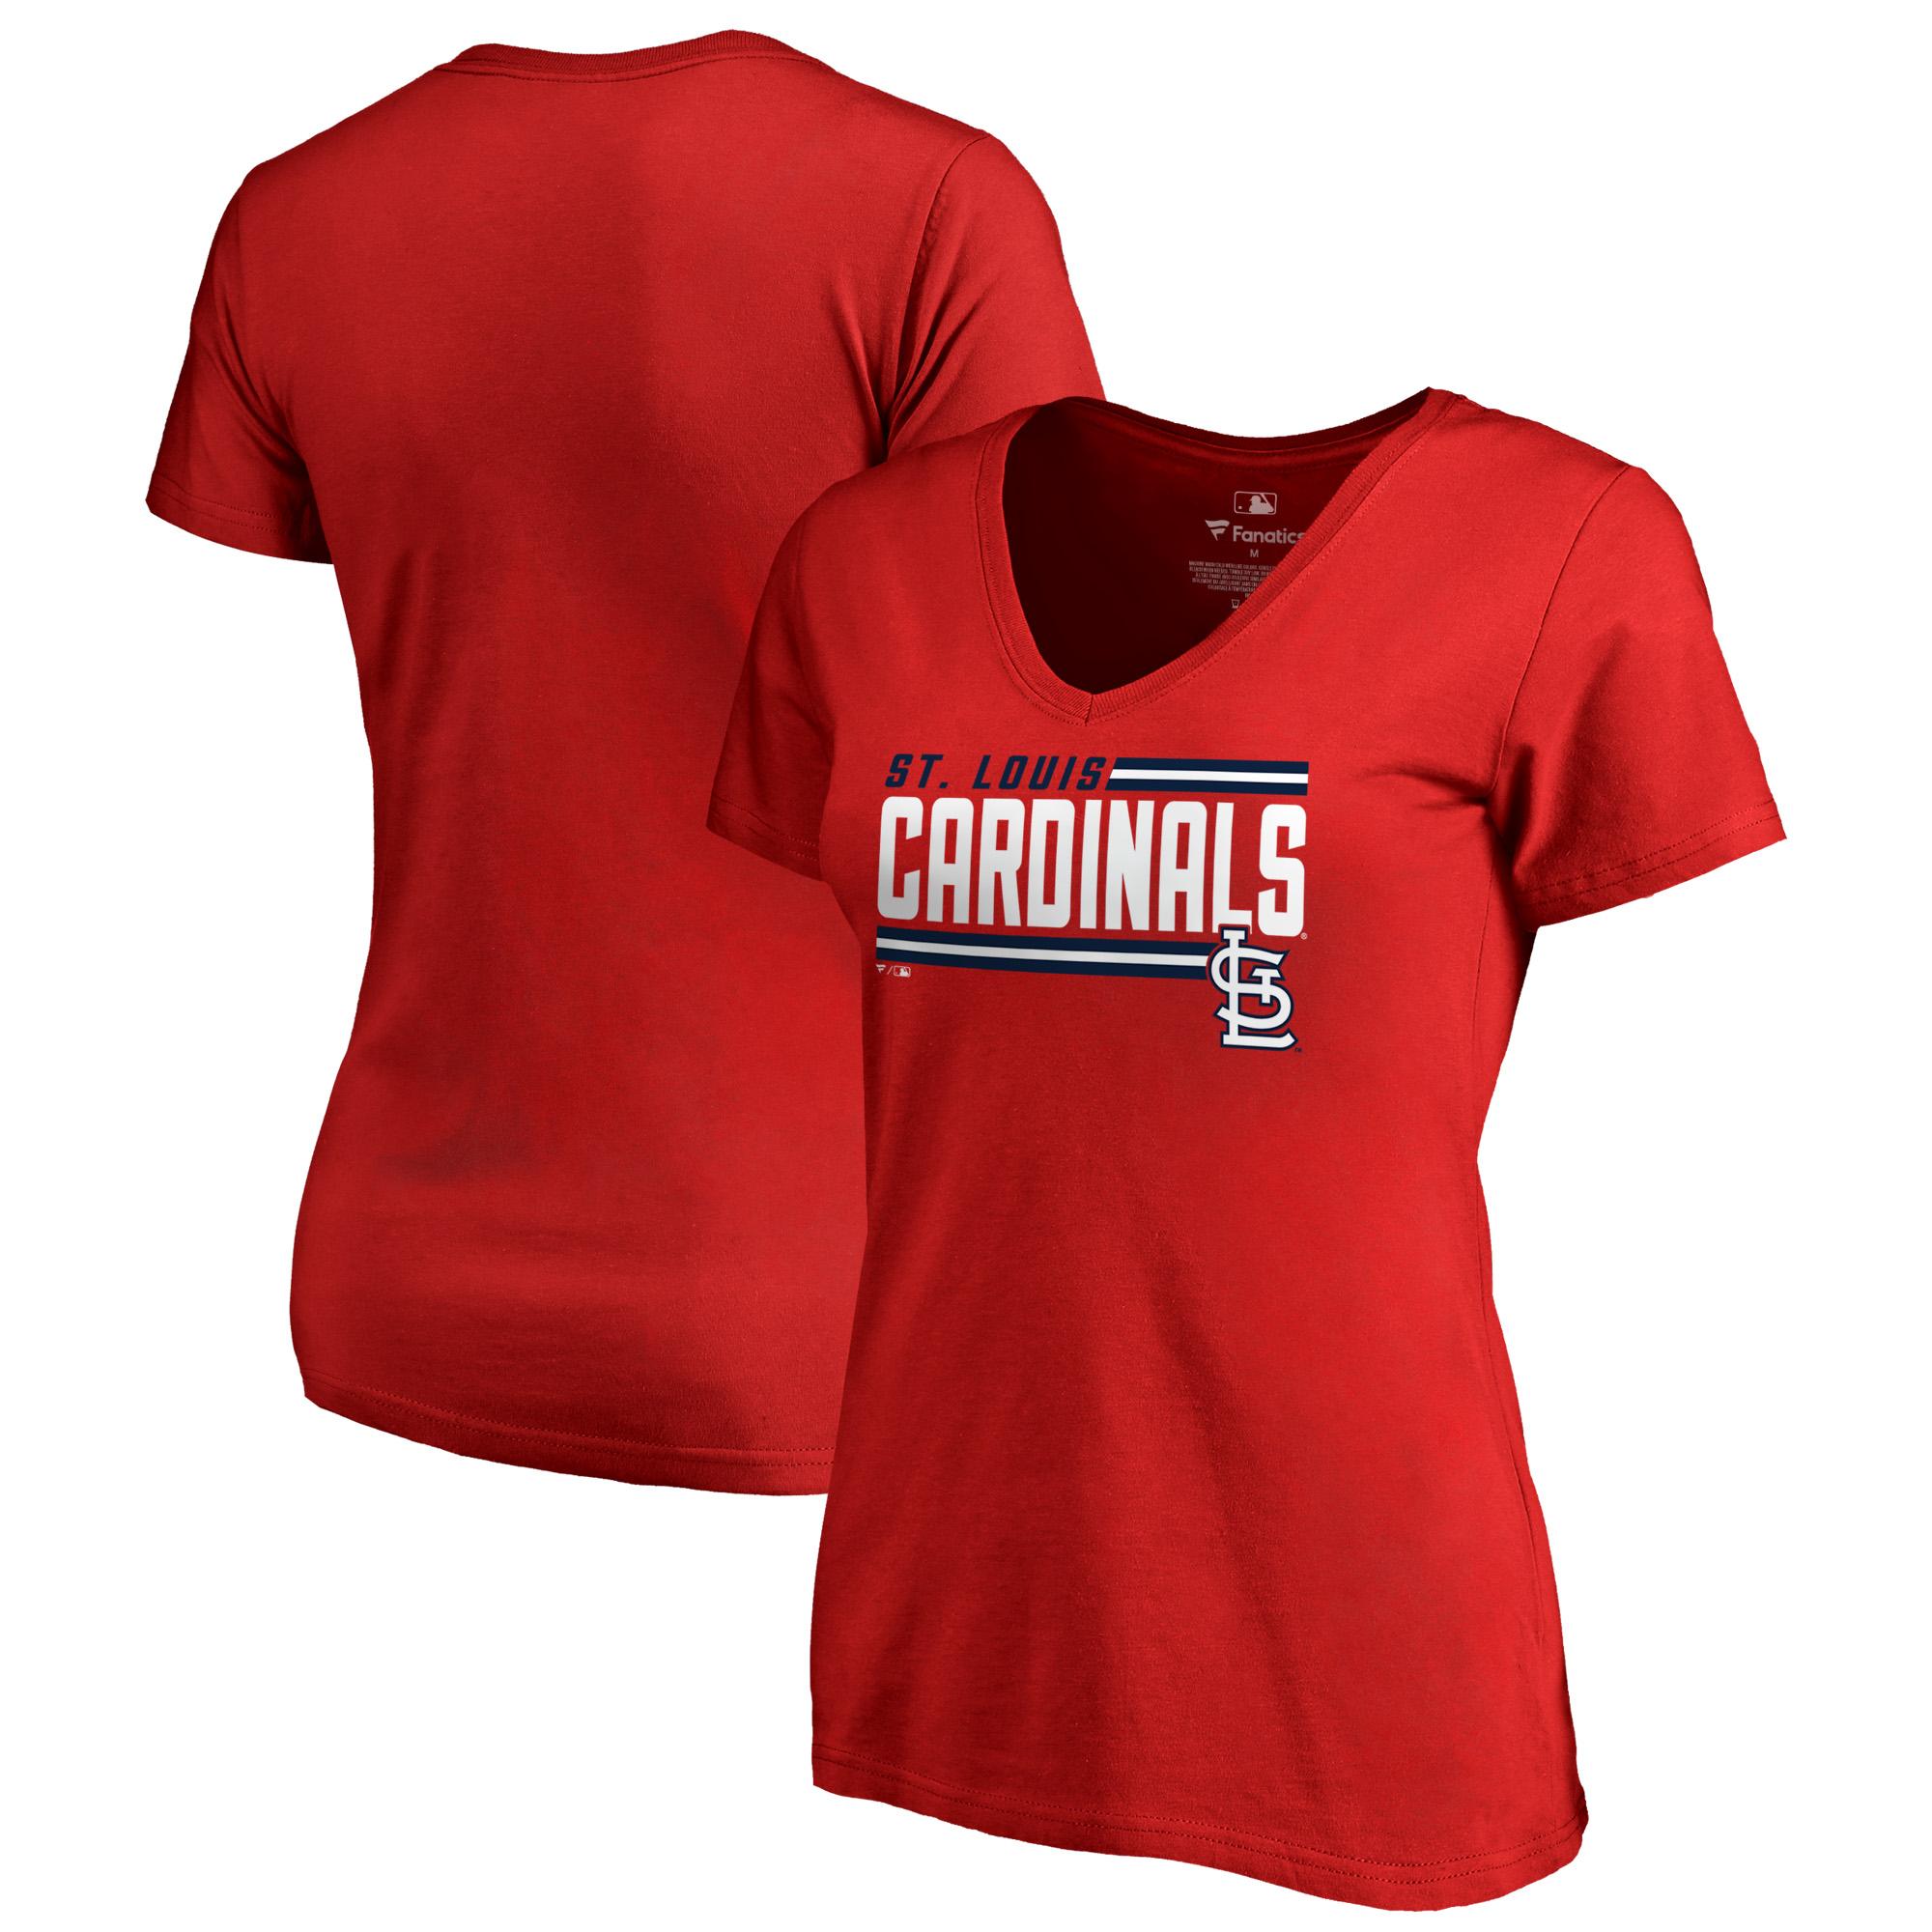 St. Louis Cardinals Fanatics Branded Women's Onside Stripe Plus Size V-Neck T-Shirt - Red